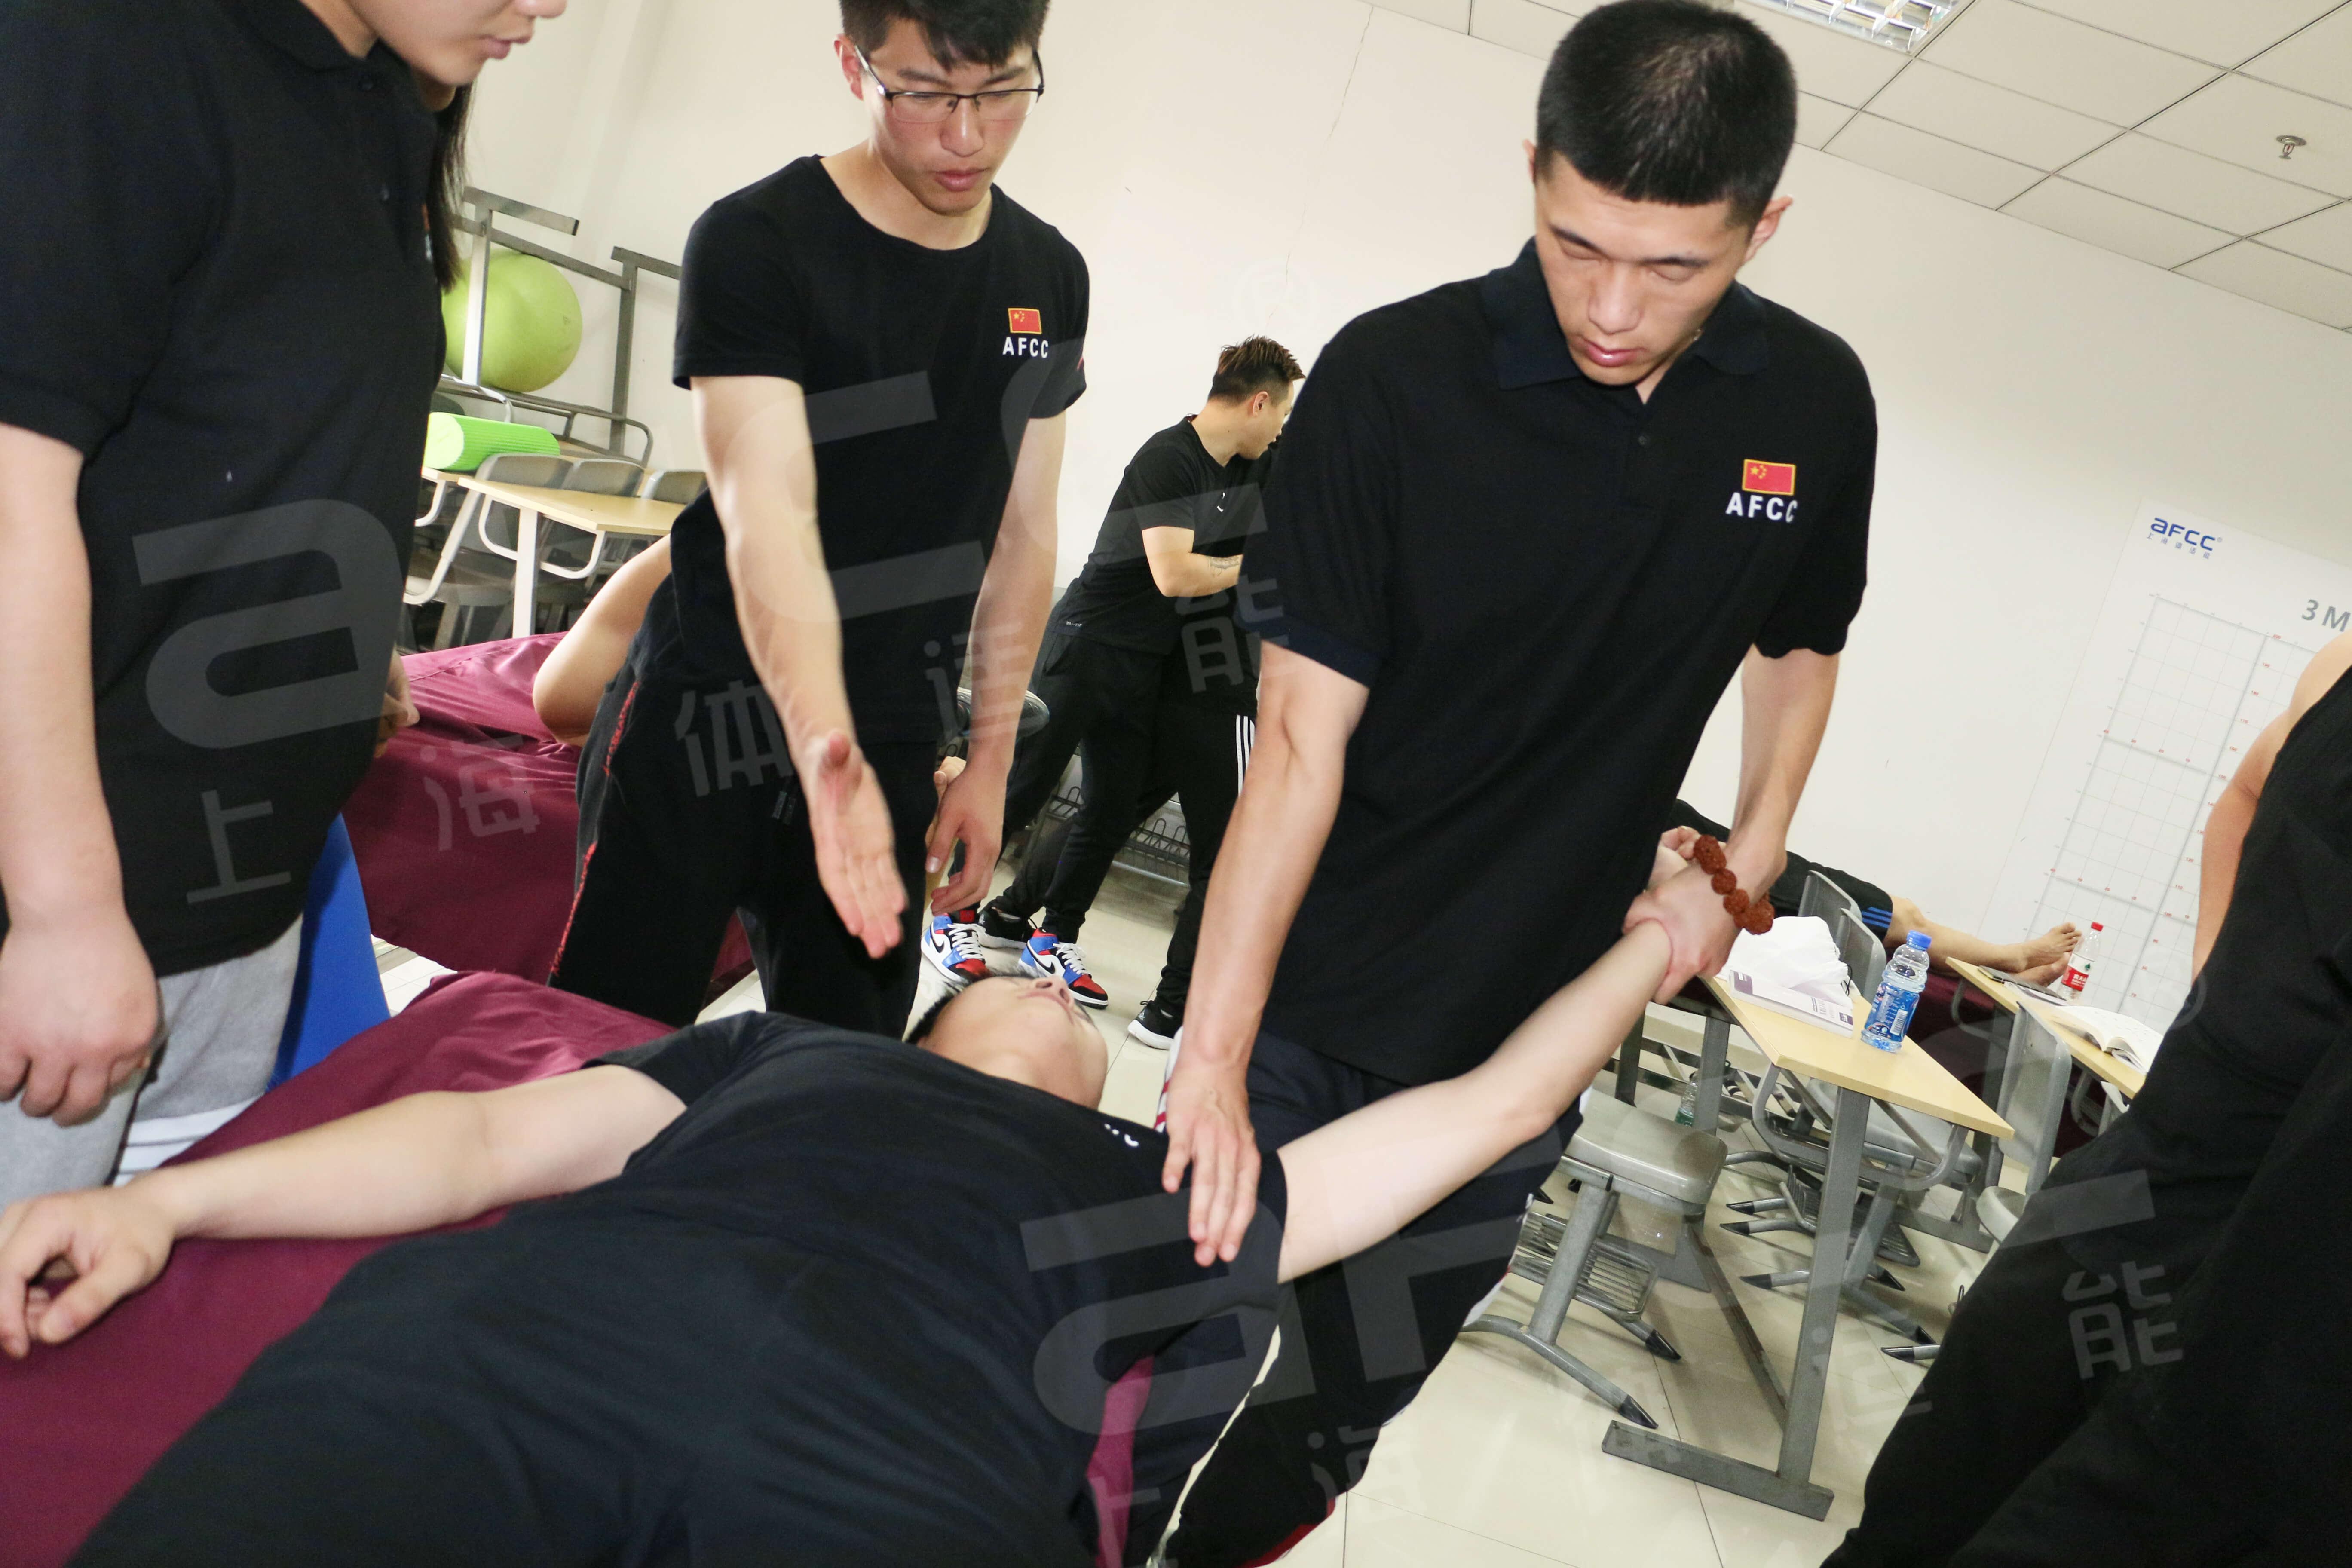 3M拉伸通过控制病患的体姿、体态进行拉